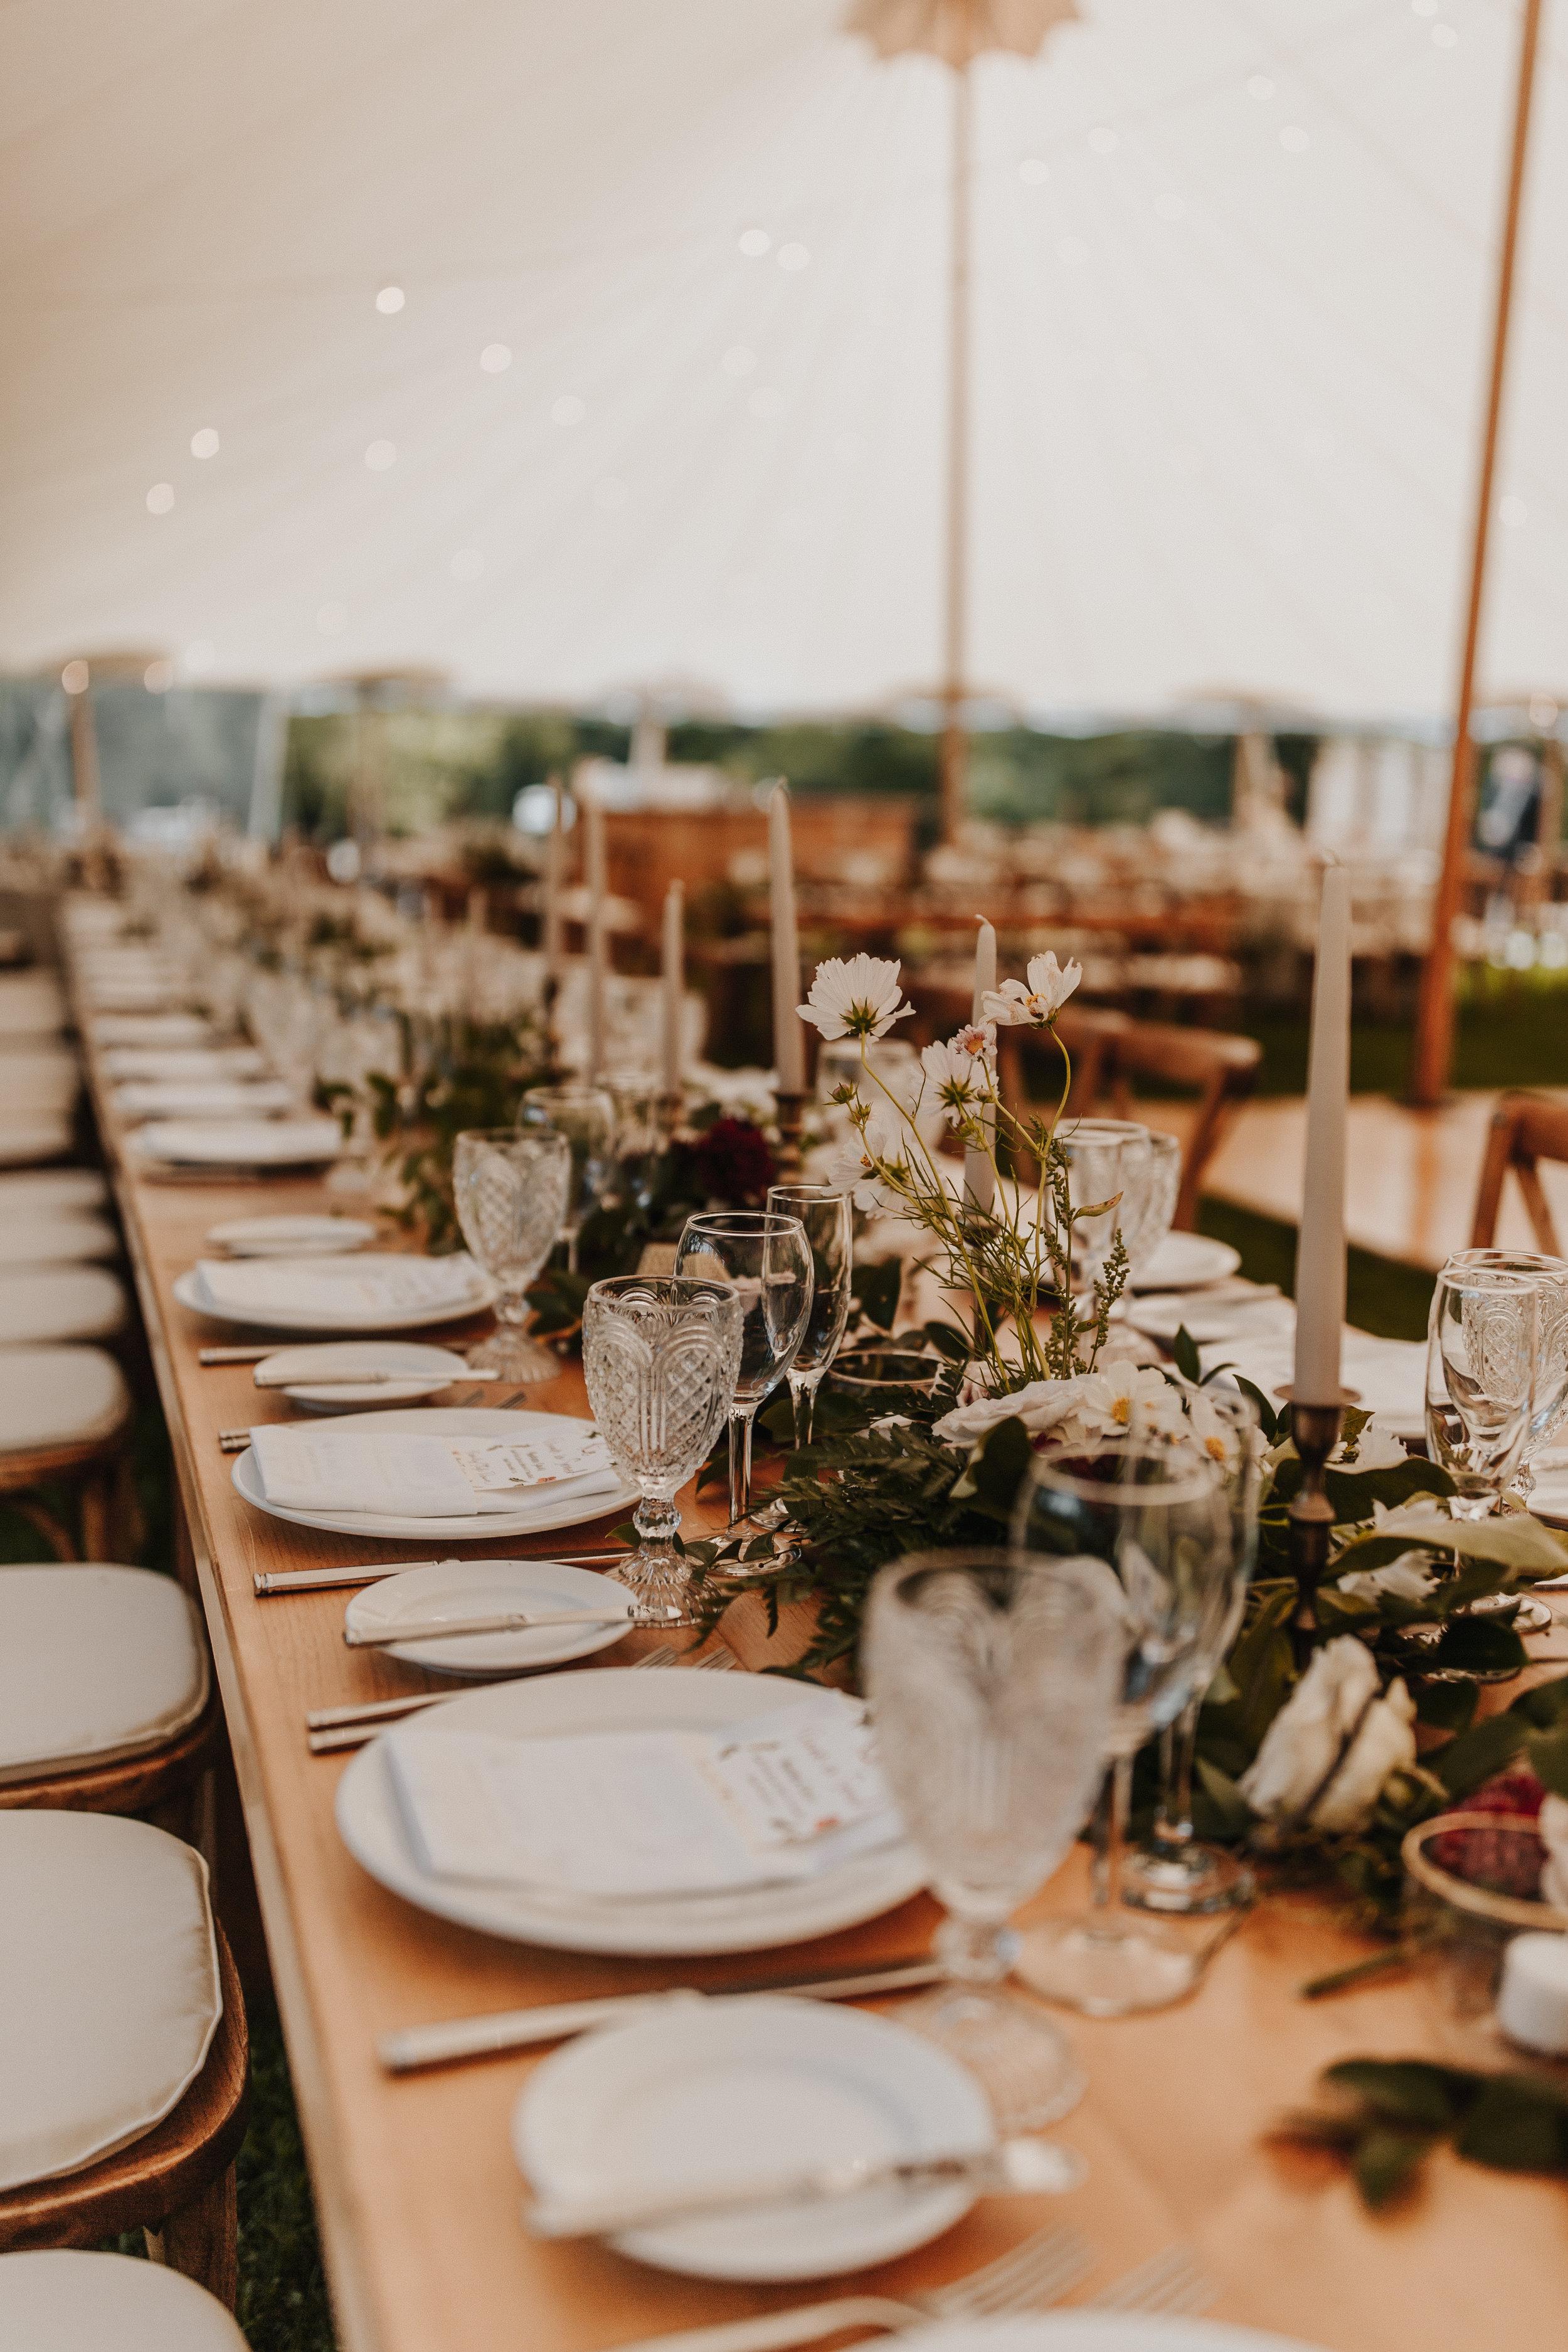 stowe-vermont-edson-hill-rustic-boho-wedding.jpg